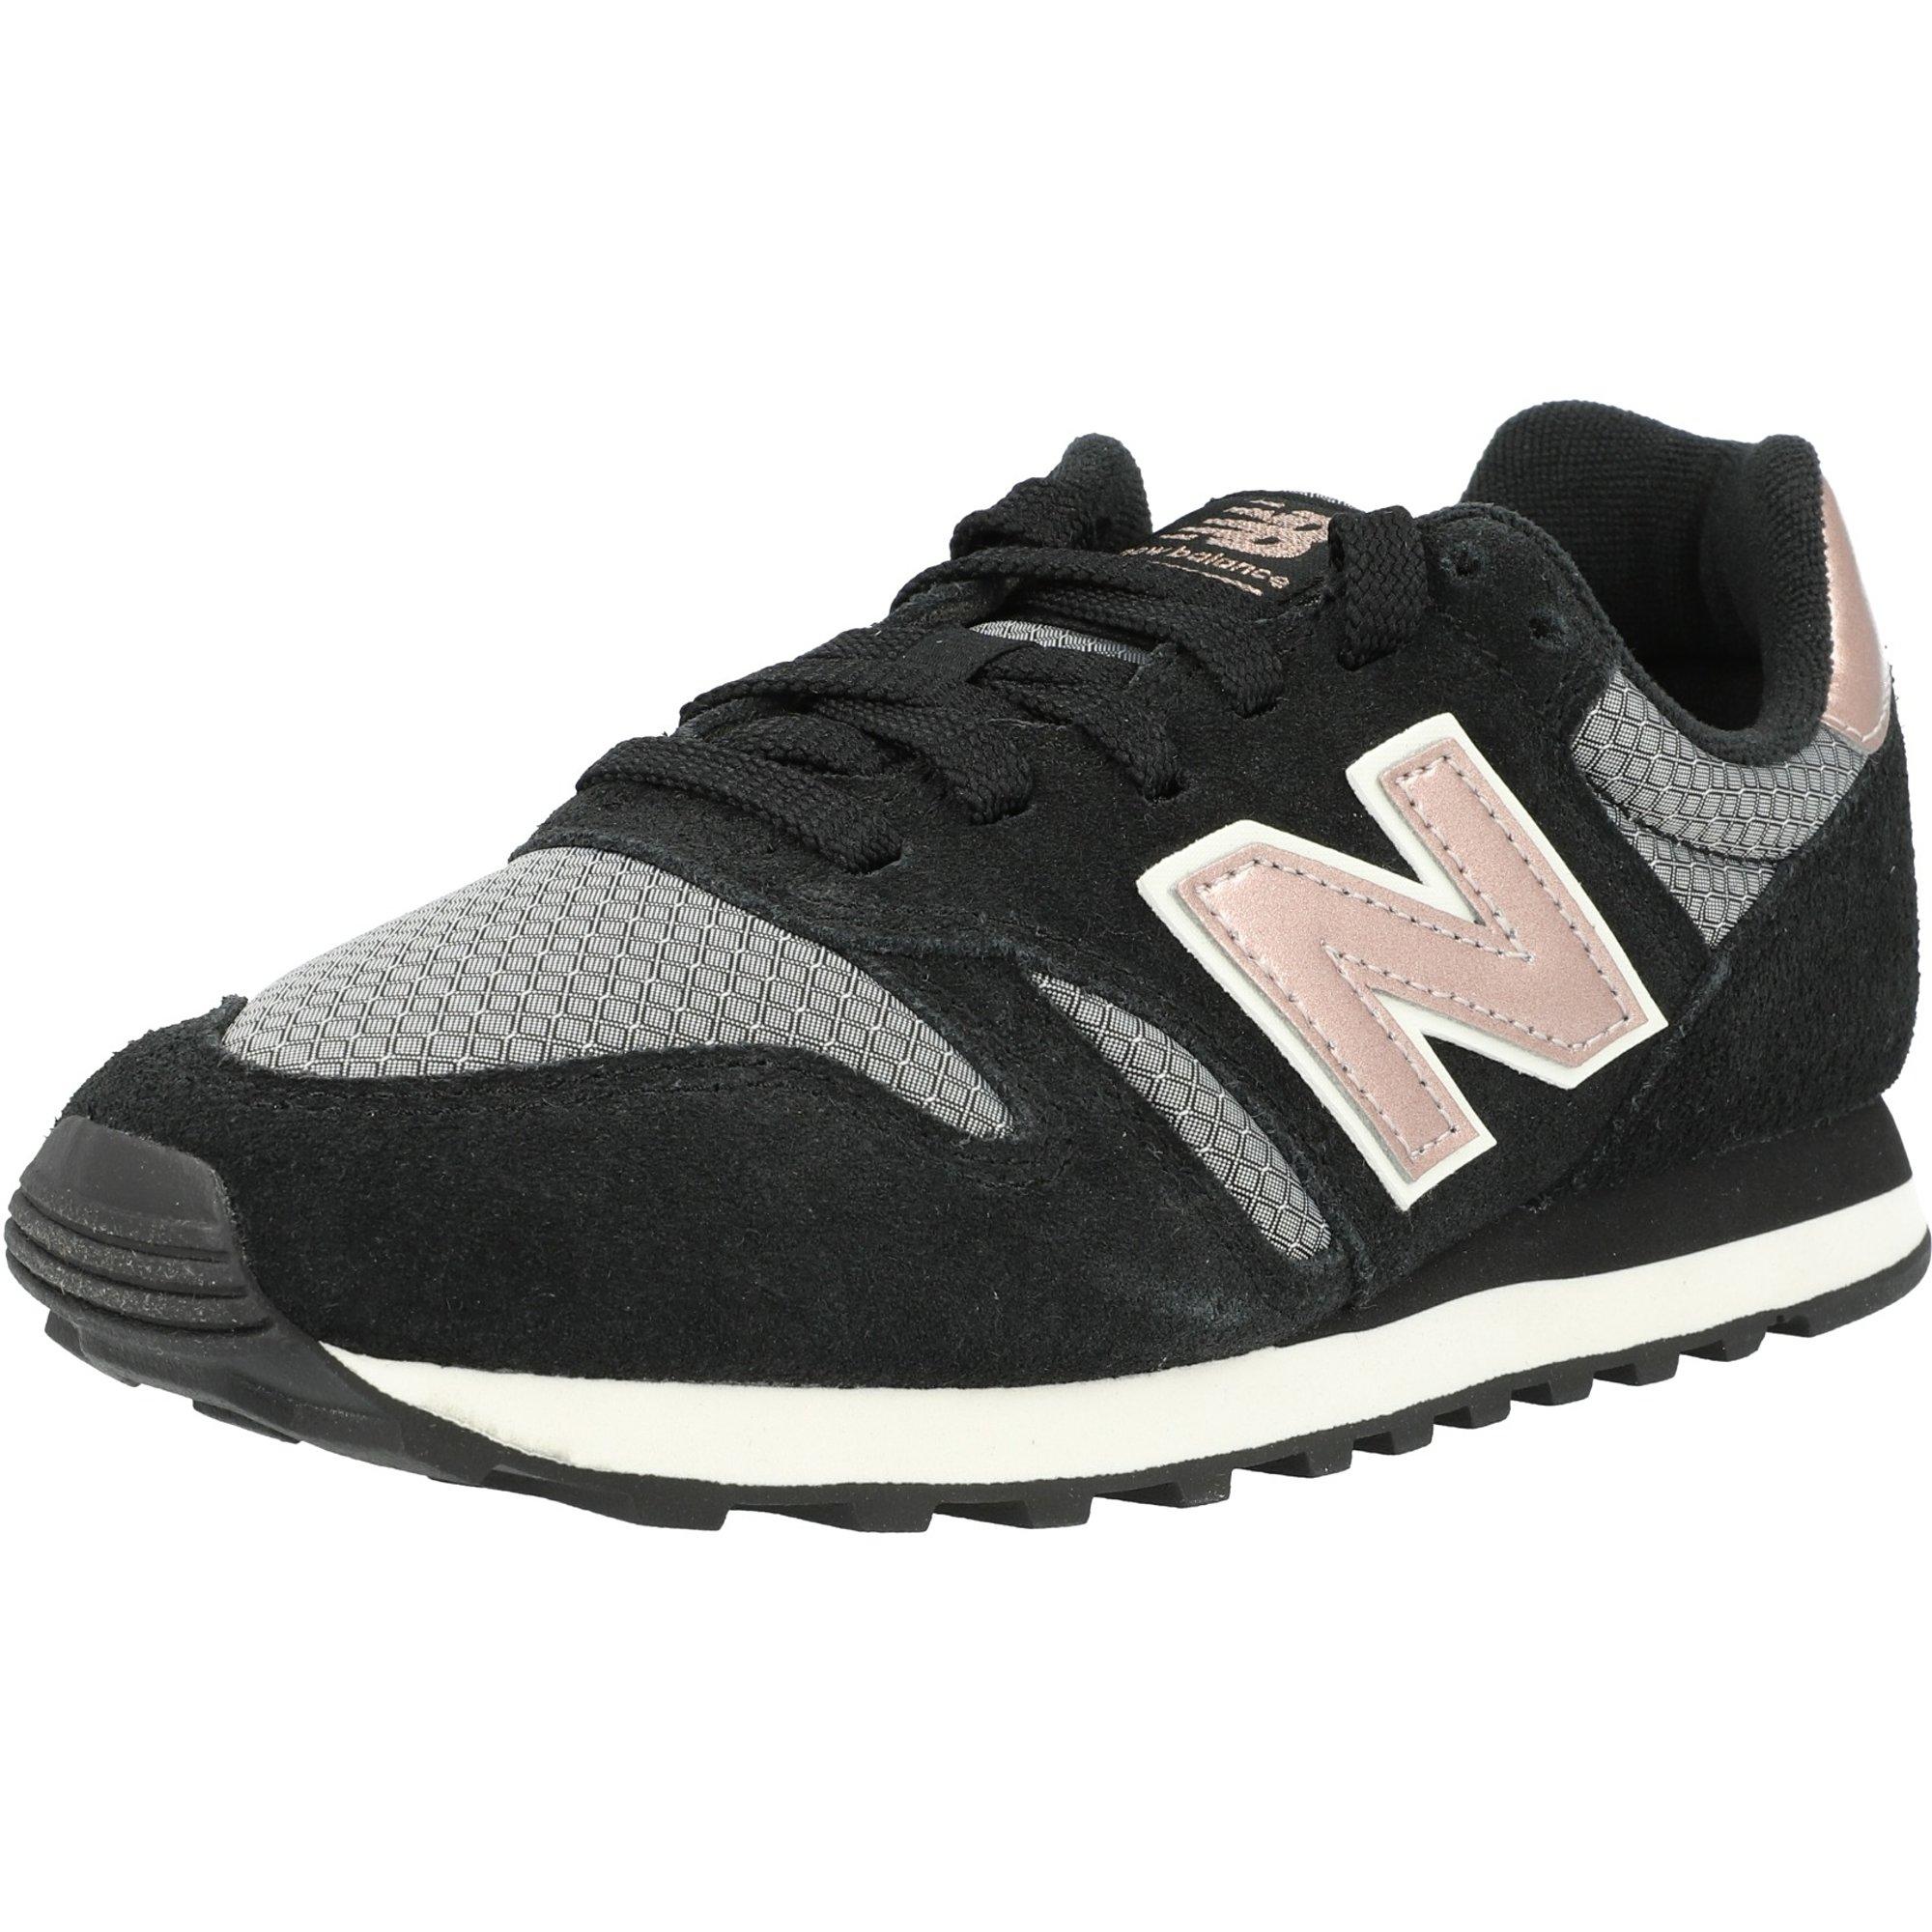 New Balance 373 Black/Champagne Leather Adult